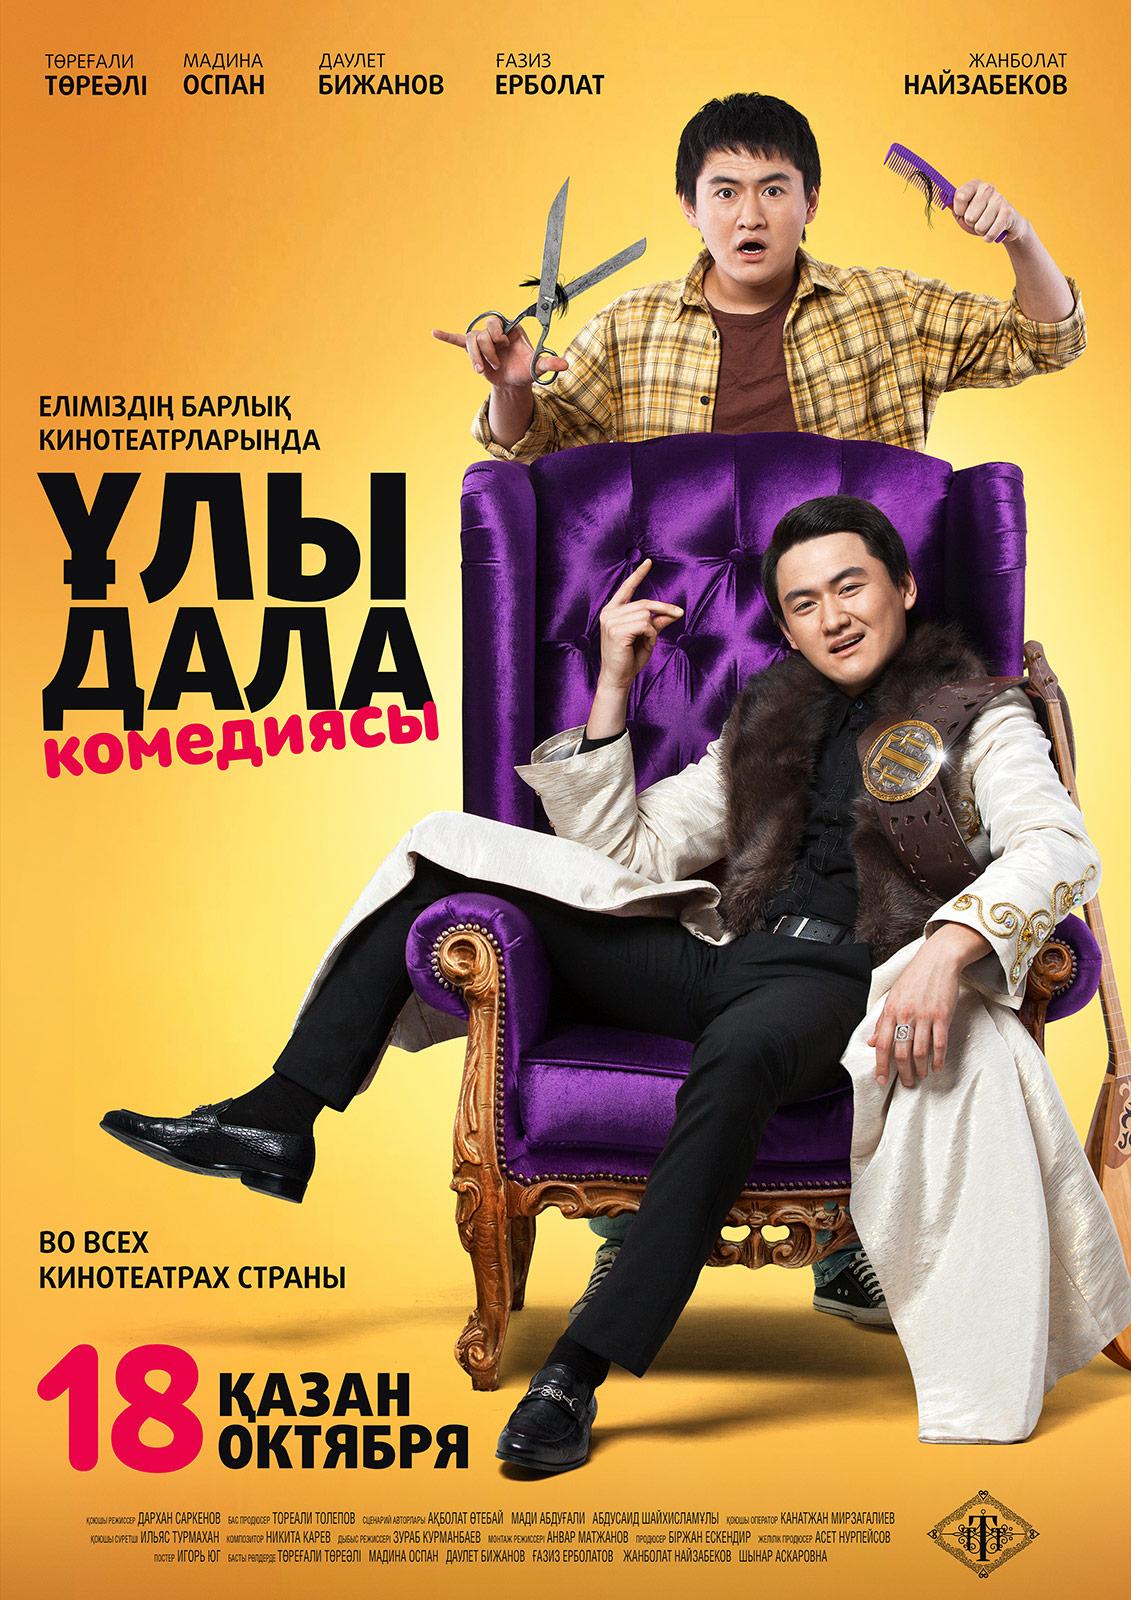 Игорь Юг. Постер «Ұлы дала комедиясы»